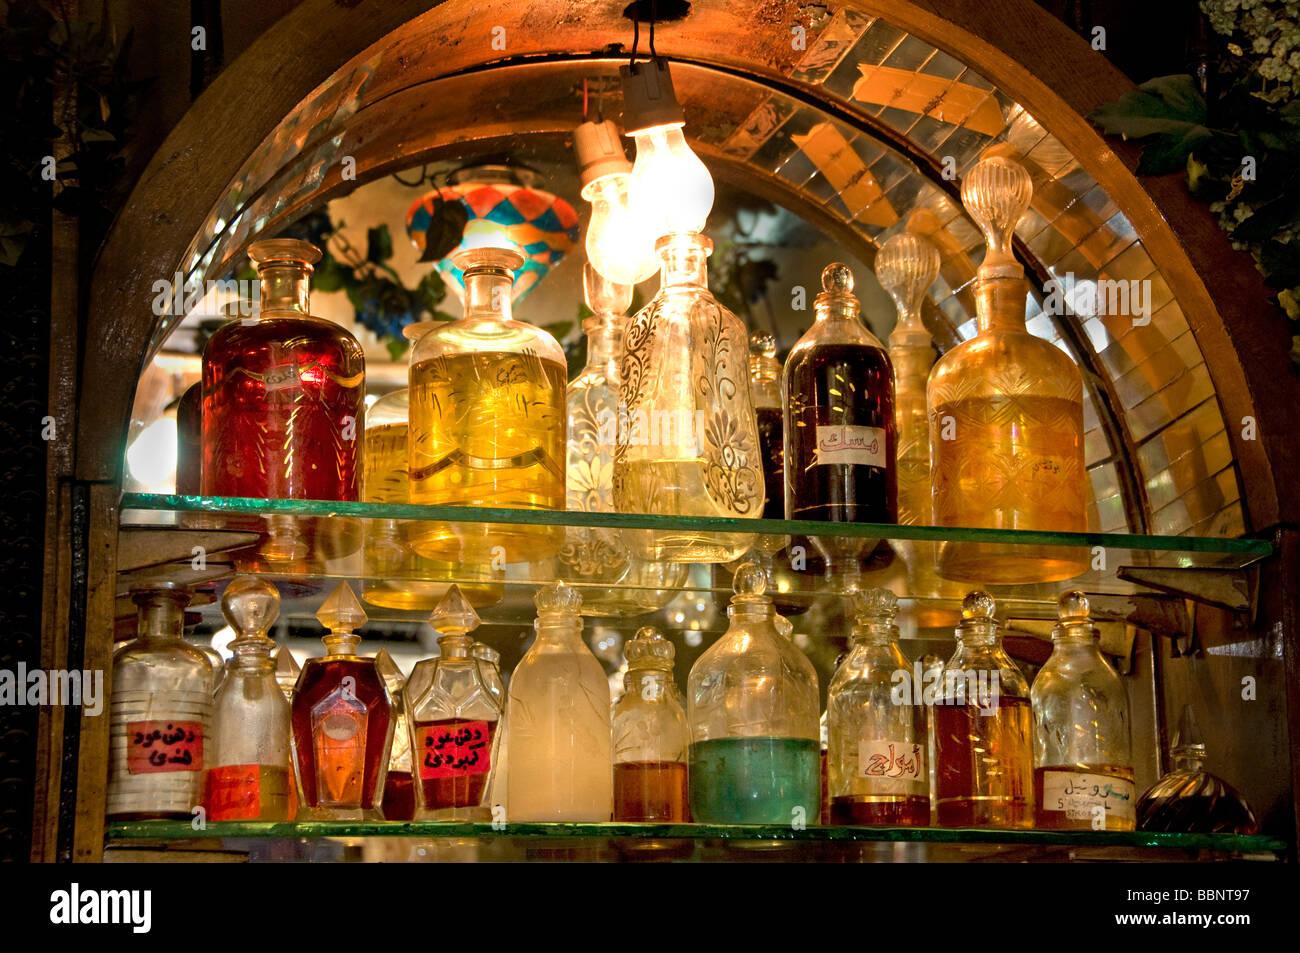 Khan el Khalili Cairo Egypt Bazaar Perfume Bottle - Stock Image